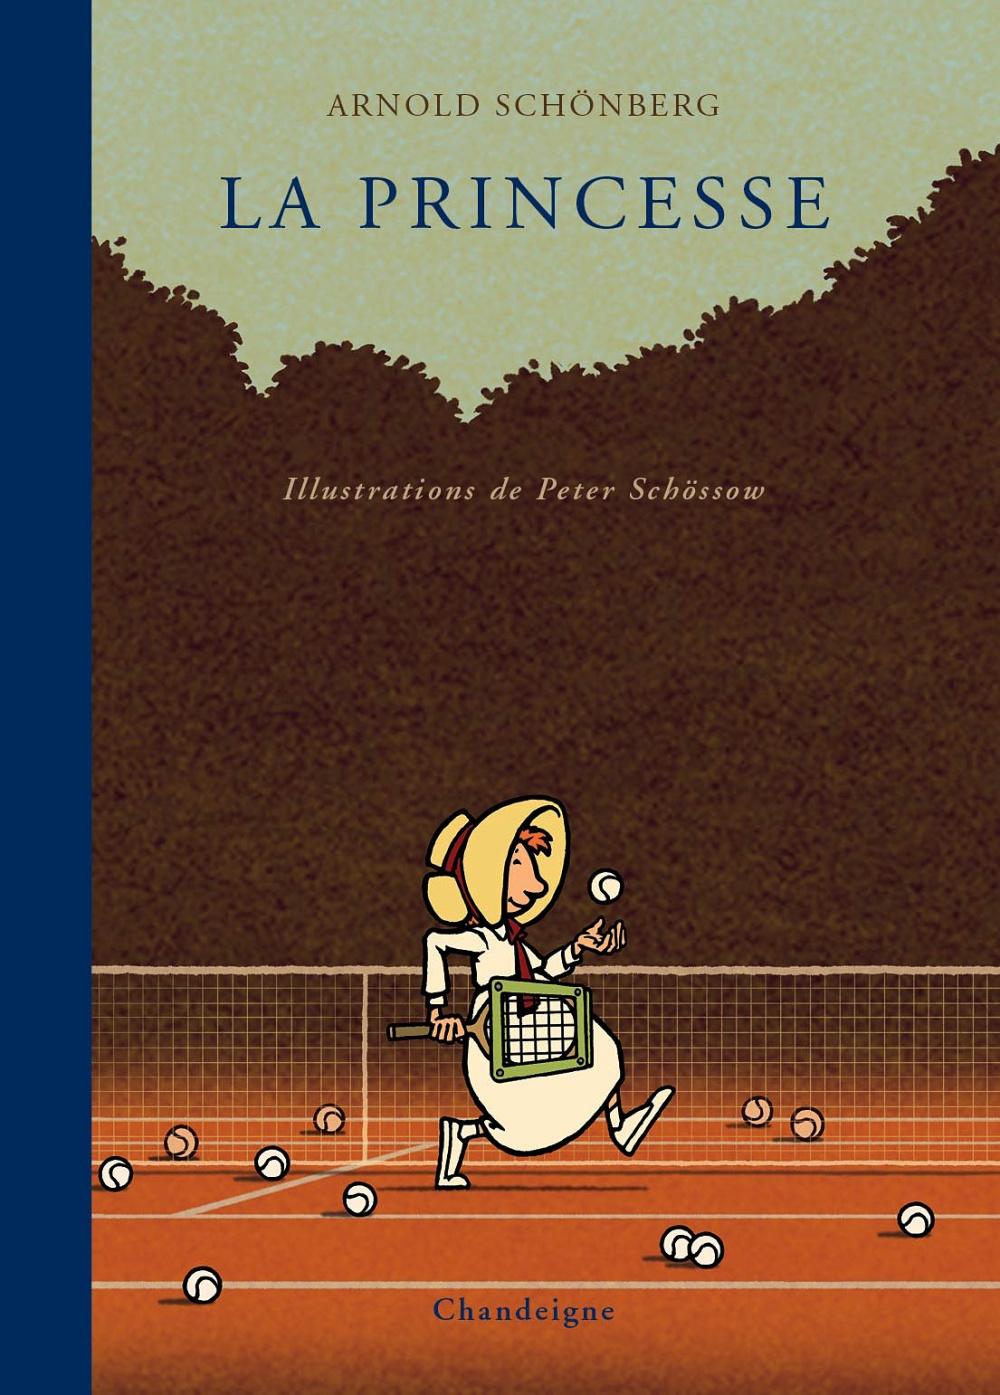 arnold-schonberg-la-princesse-couverture.jpg